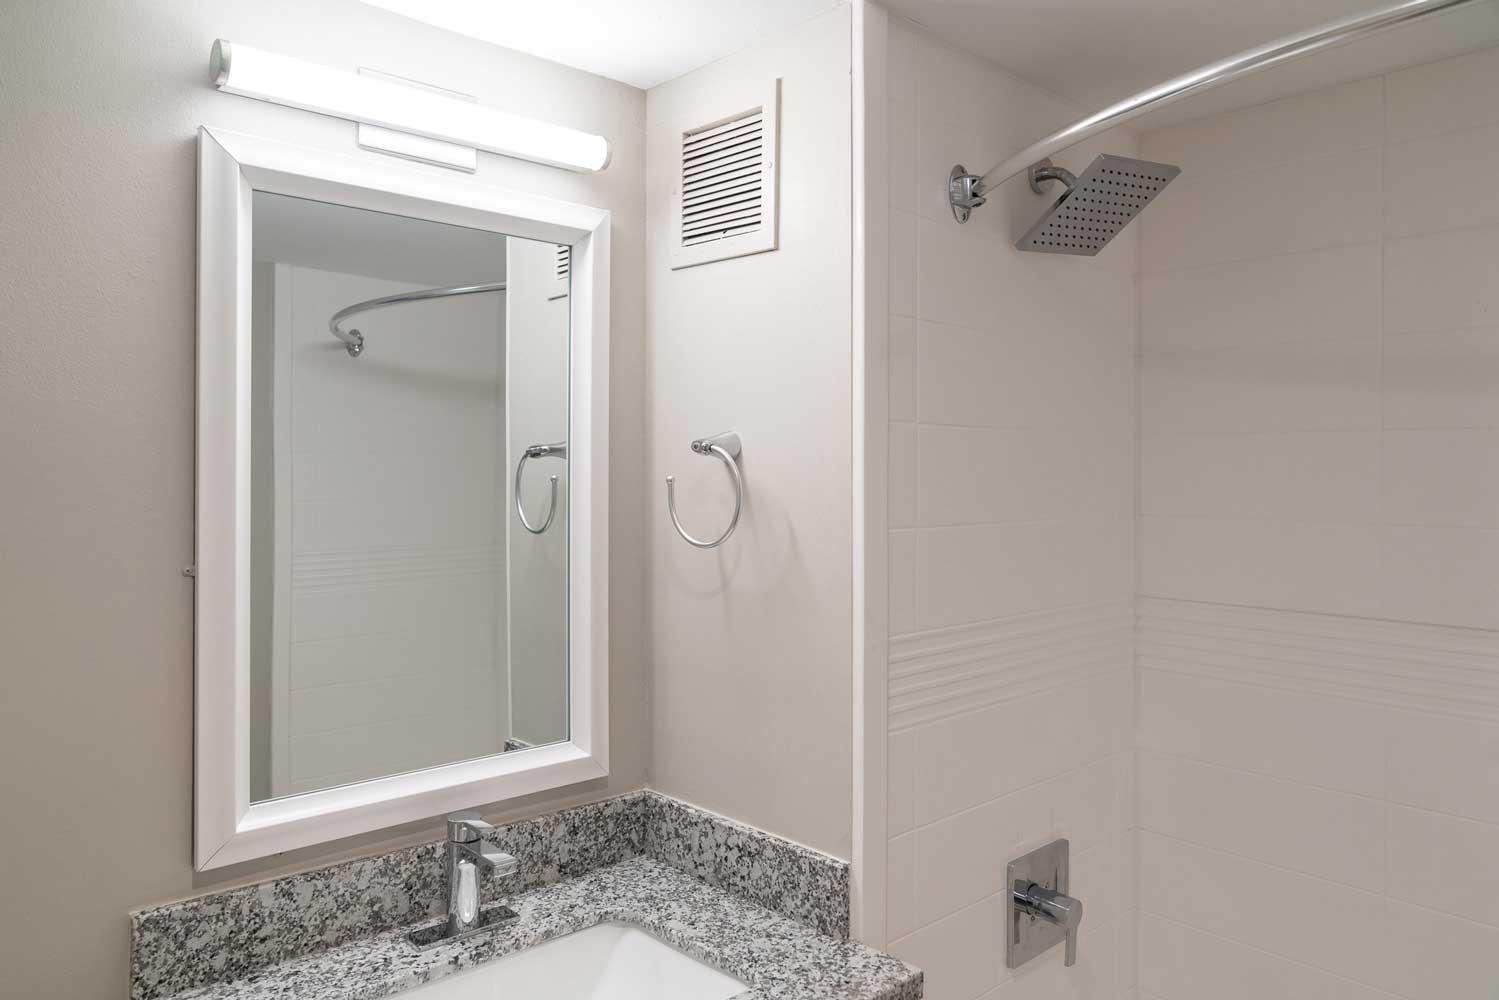 Modern Bathroom Furnishings at View at Kessler Park Apartments in Dallas, TX